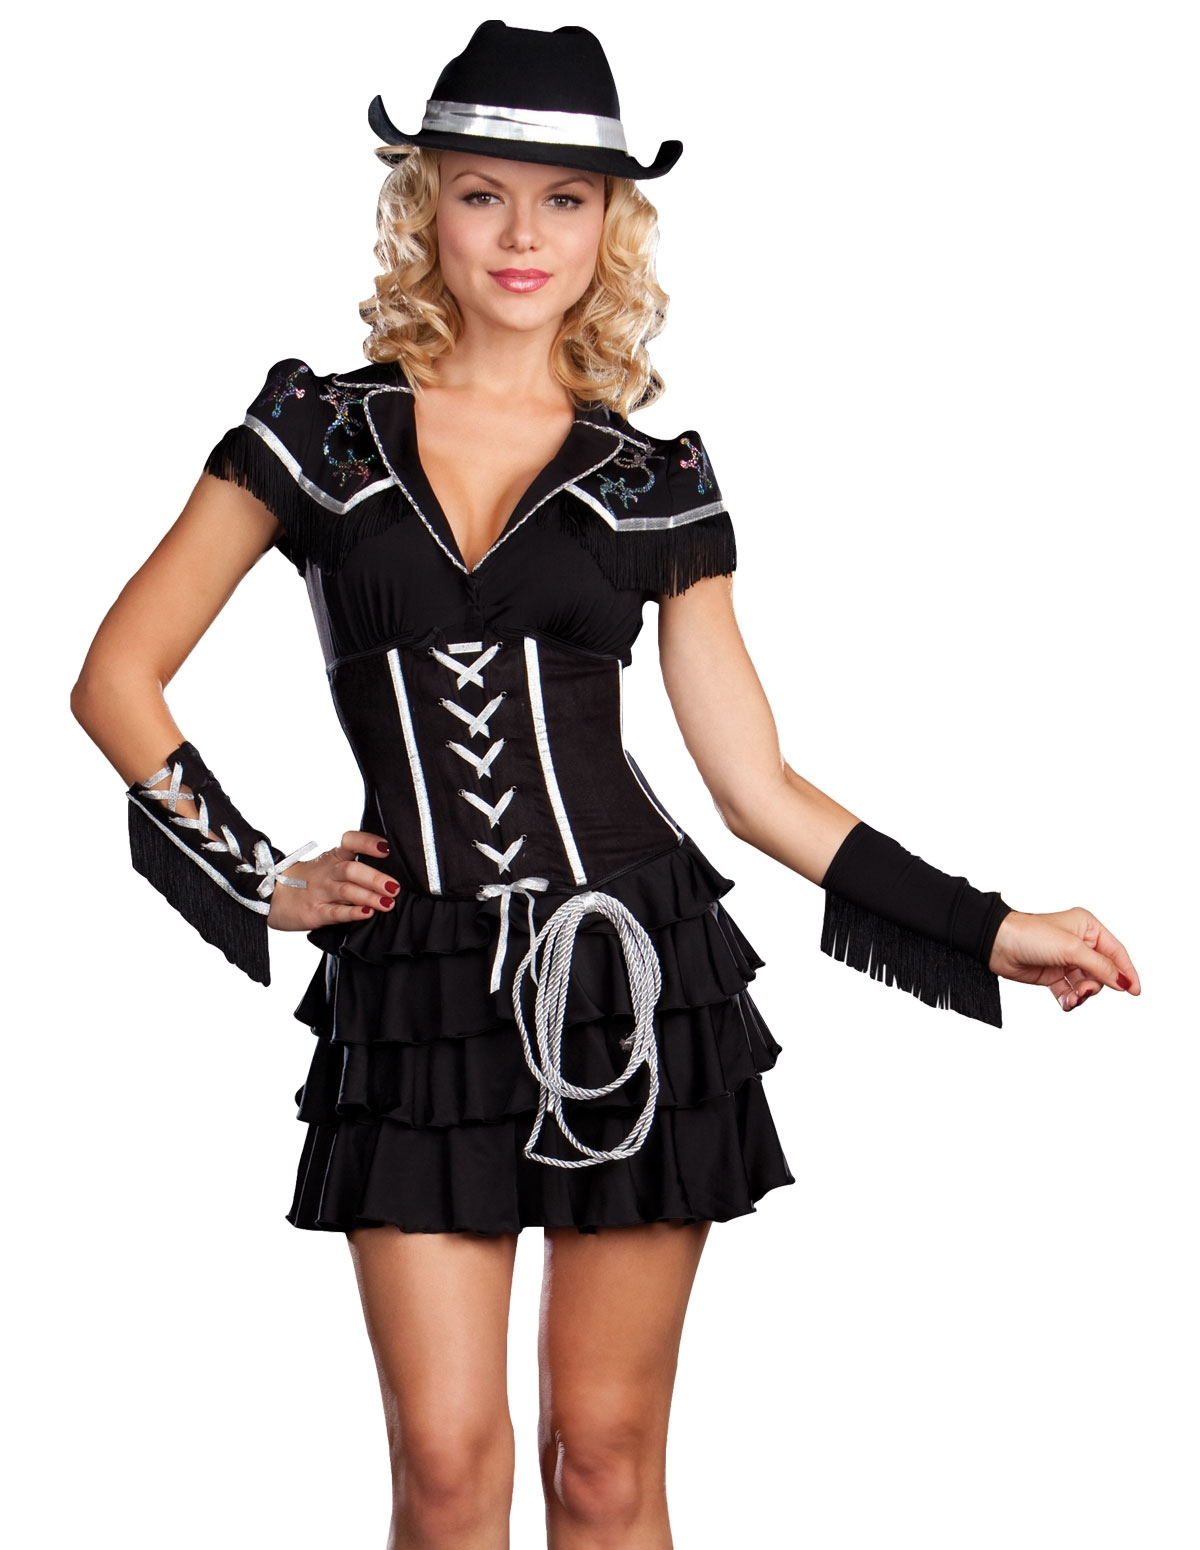 Diamond Cowgirl Costume